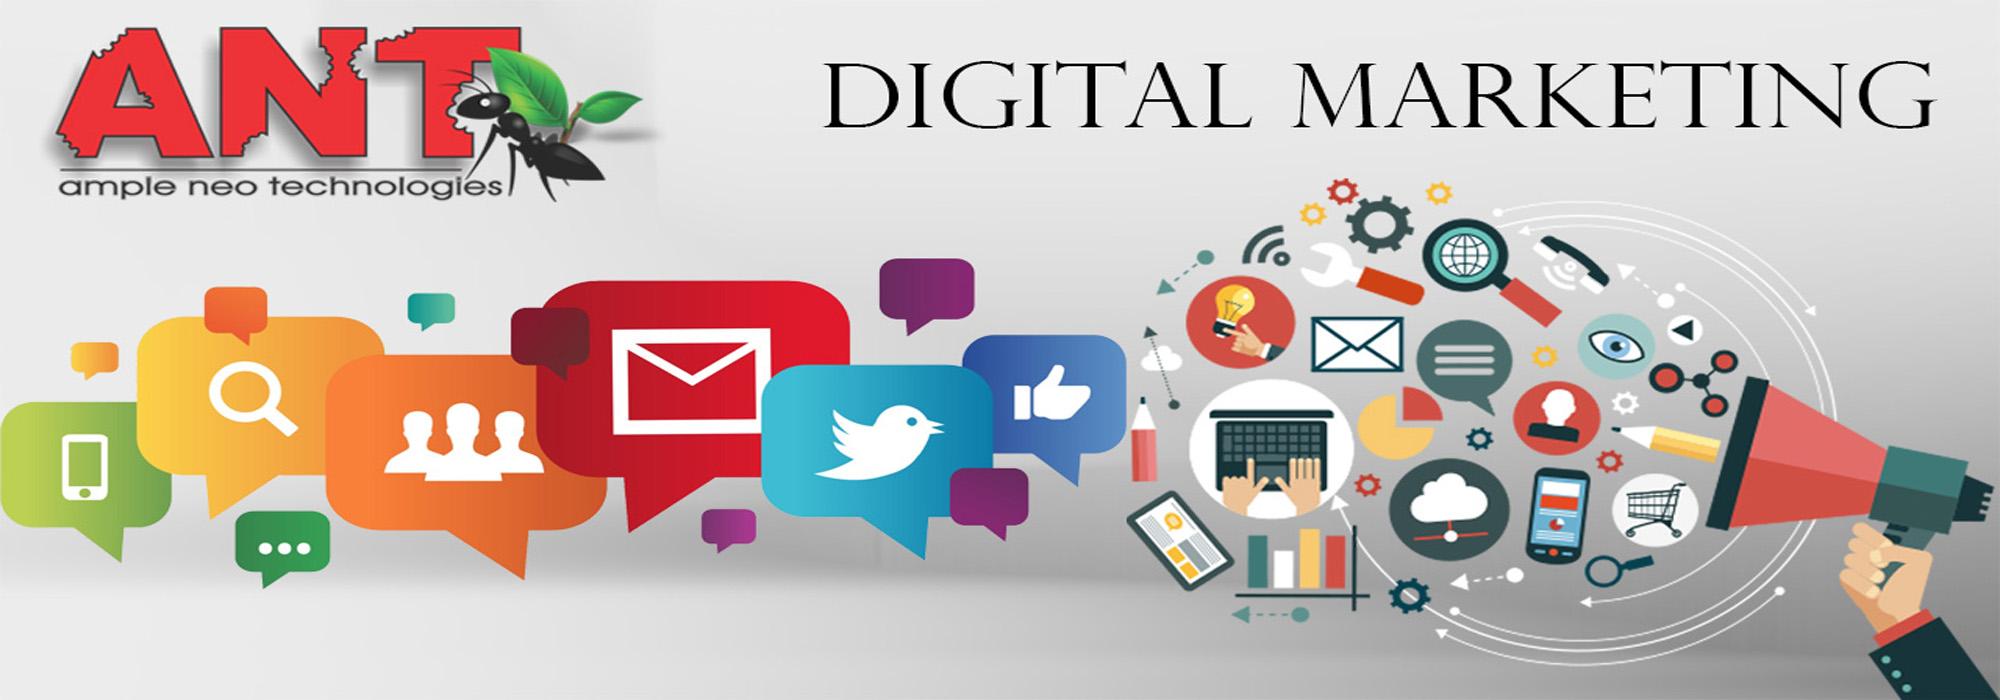 Ample Neo Technologies_image2